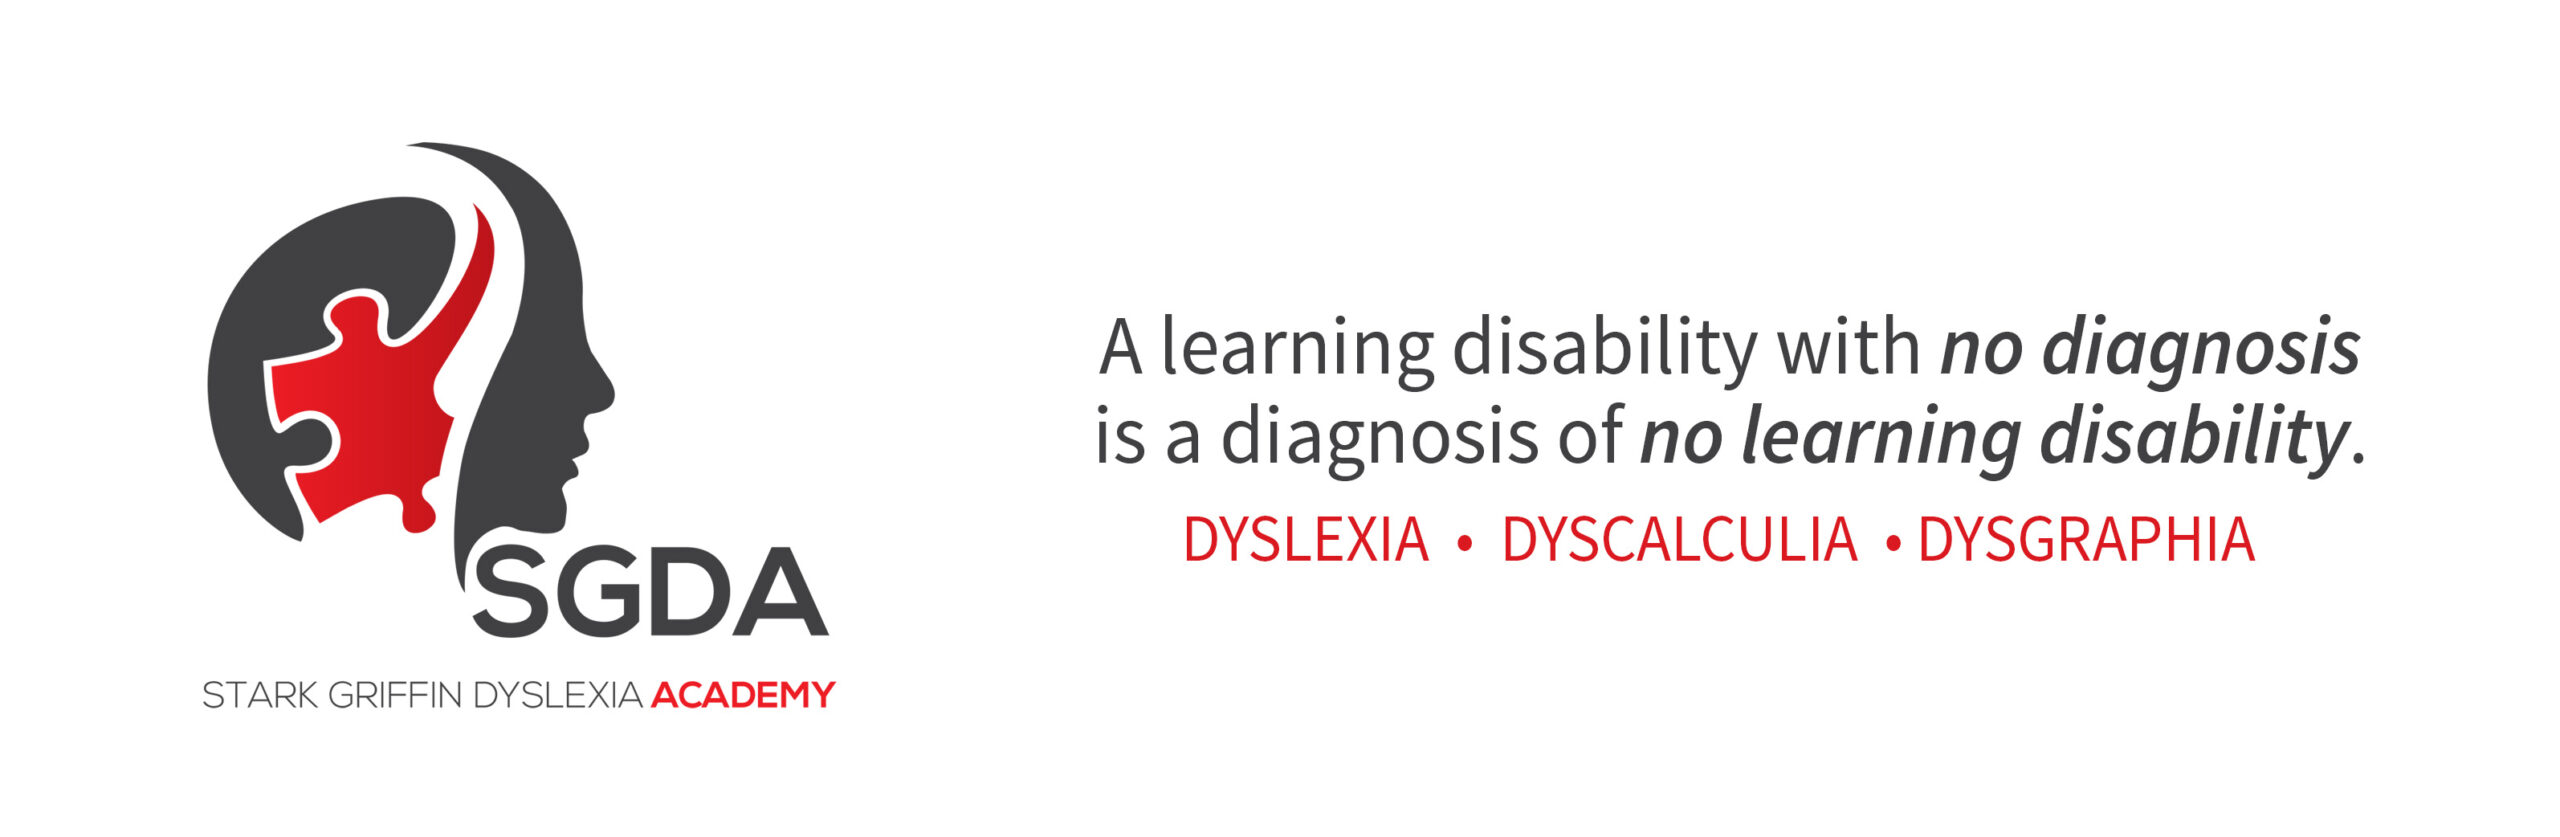 SGDA Dyslexia Professional Refresher Course